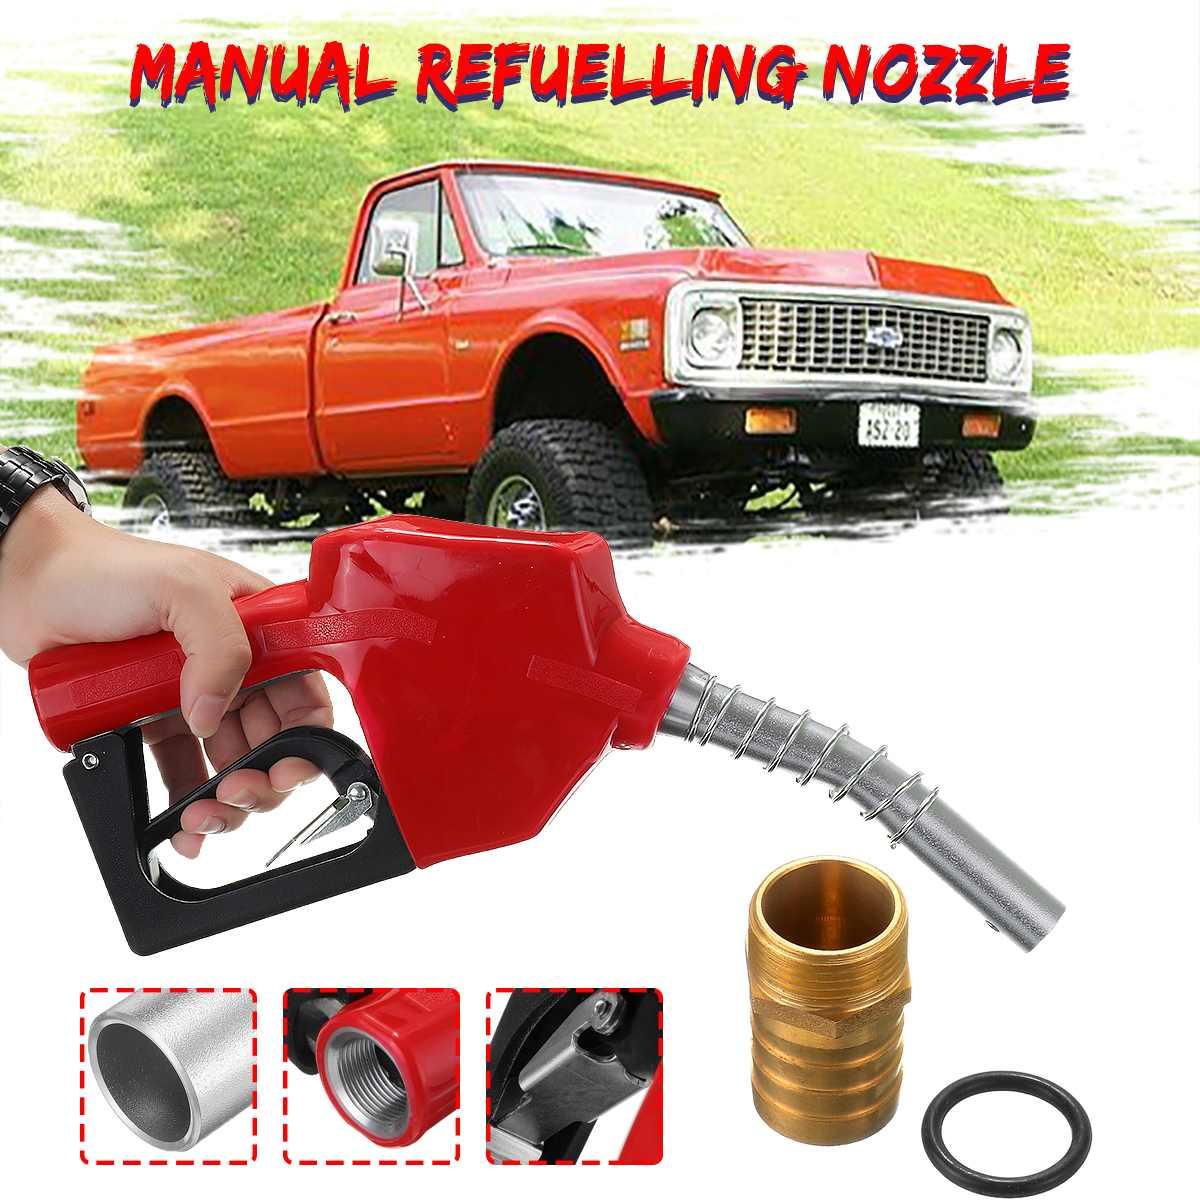 Refilling Nozzle Gun Automatic Cut Off Fuel Refilling Nozzle Diesel Oil Dispensing Oil Water Refueling Gun